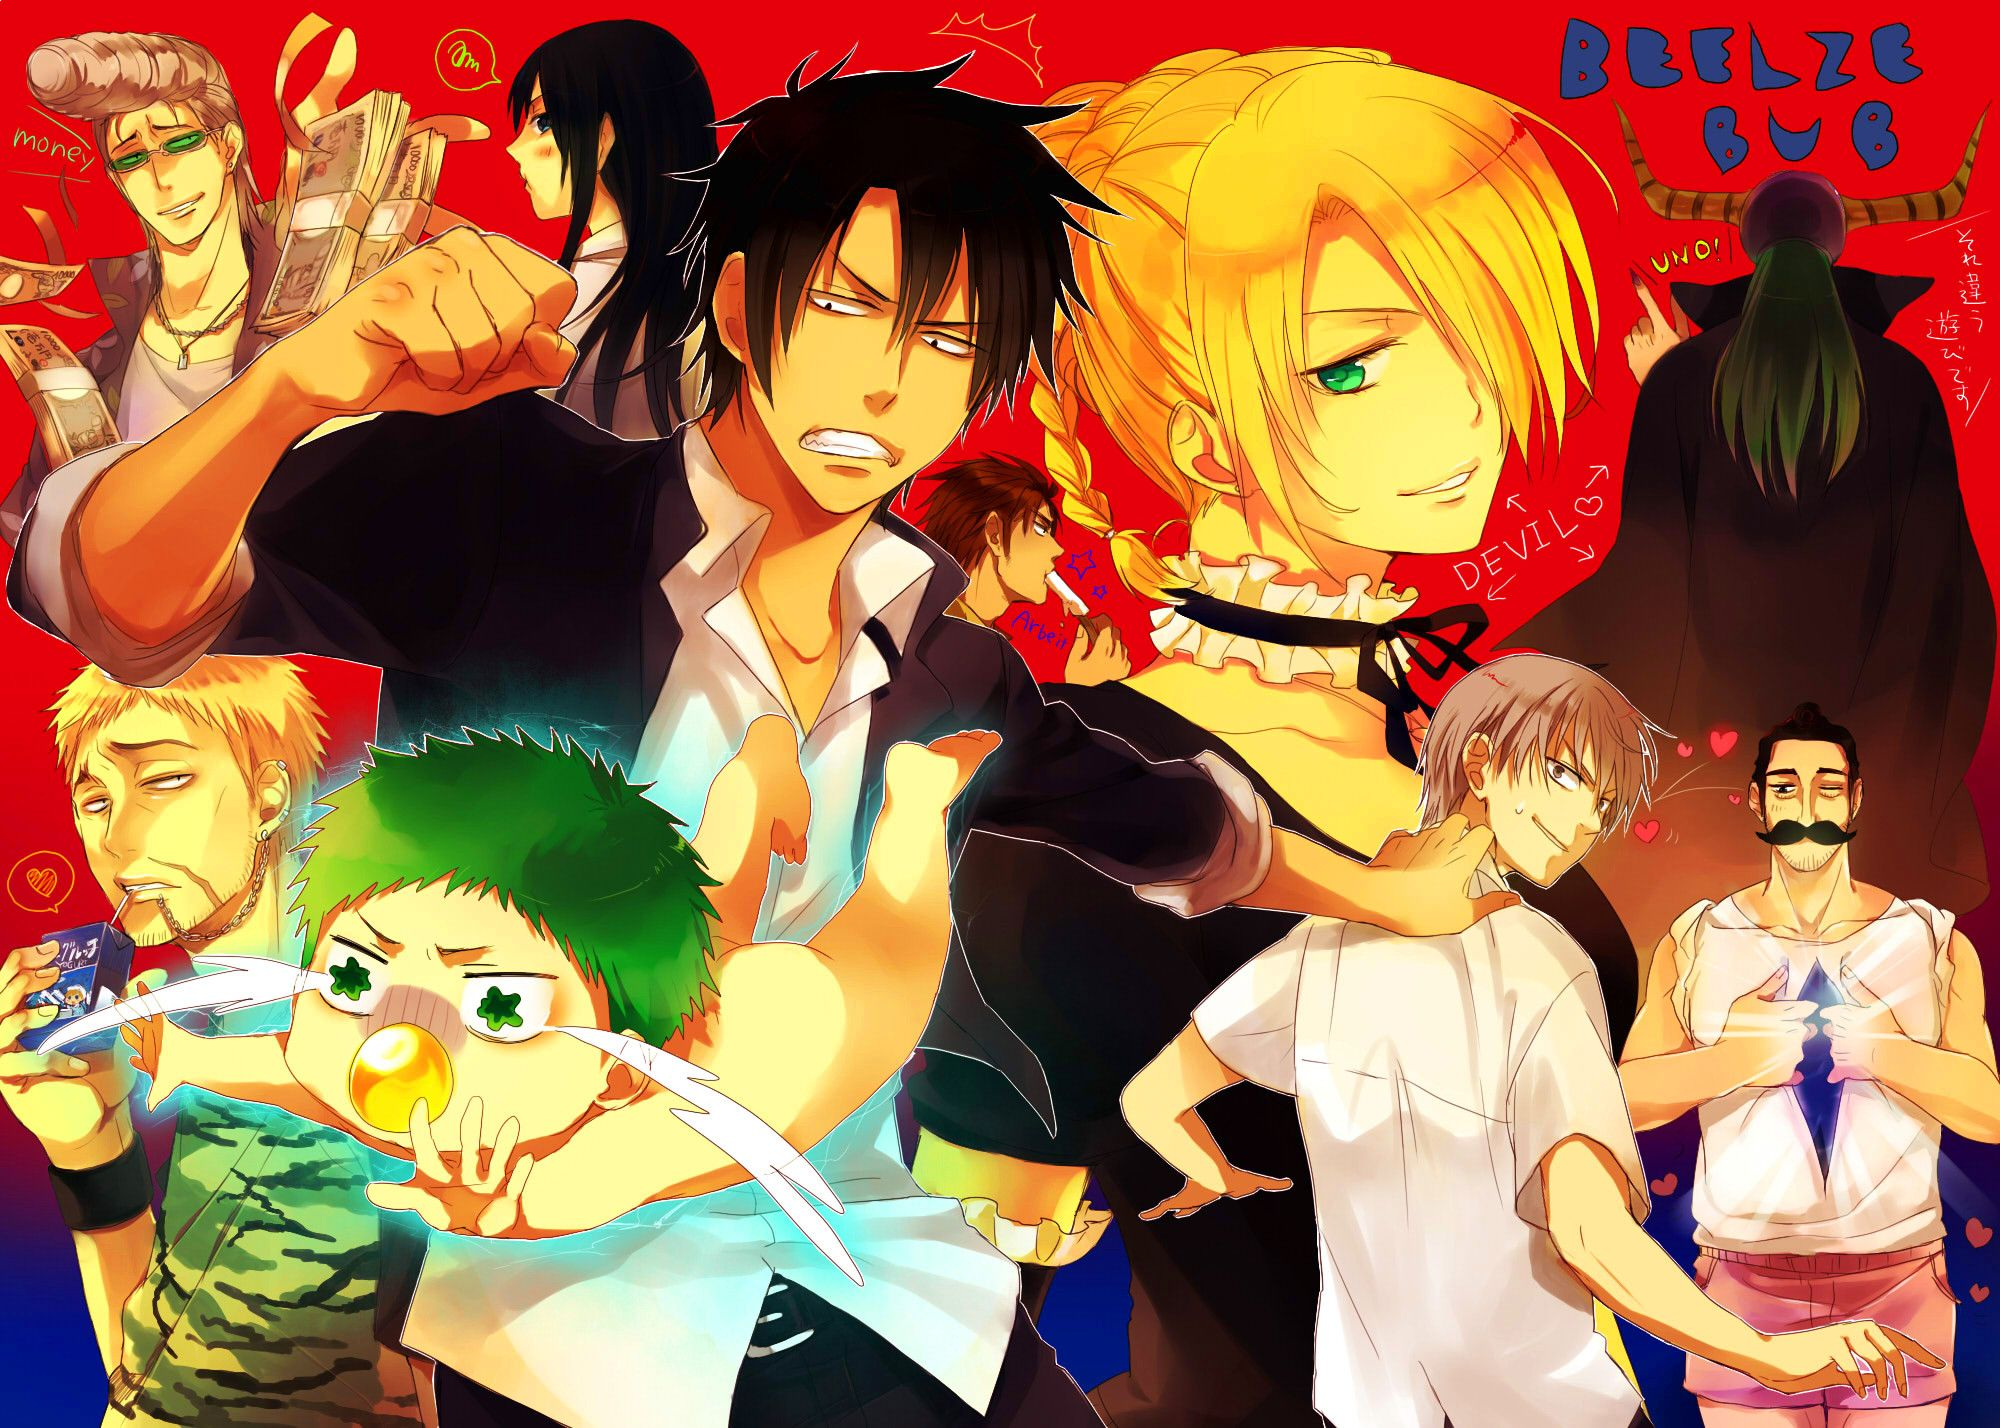 Anime Beelzebub Wallpaper beelzebub Pinterest Anime